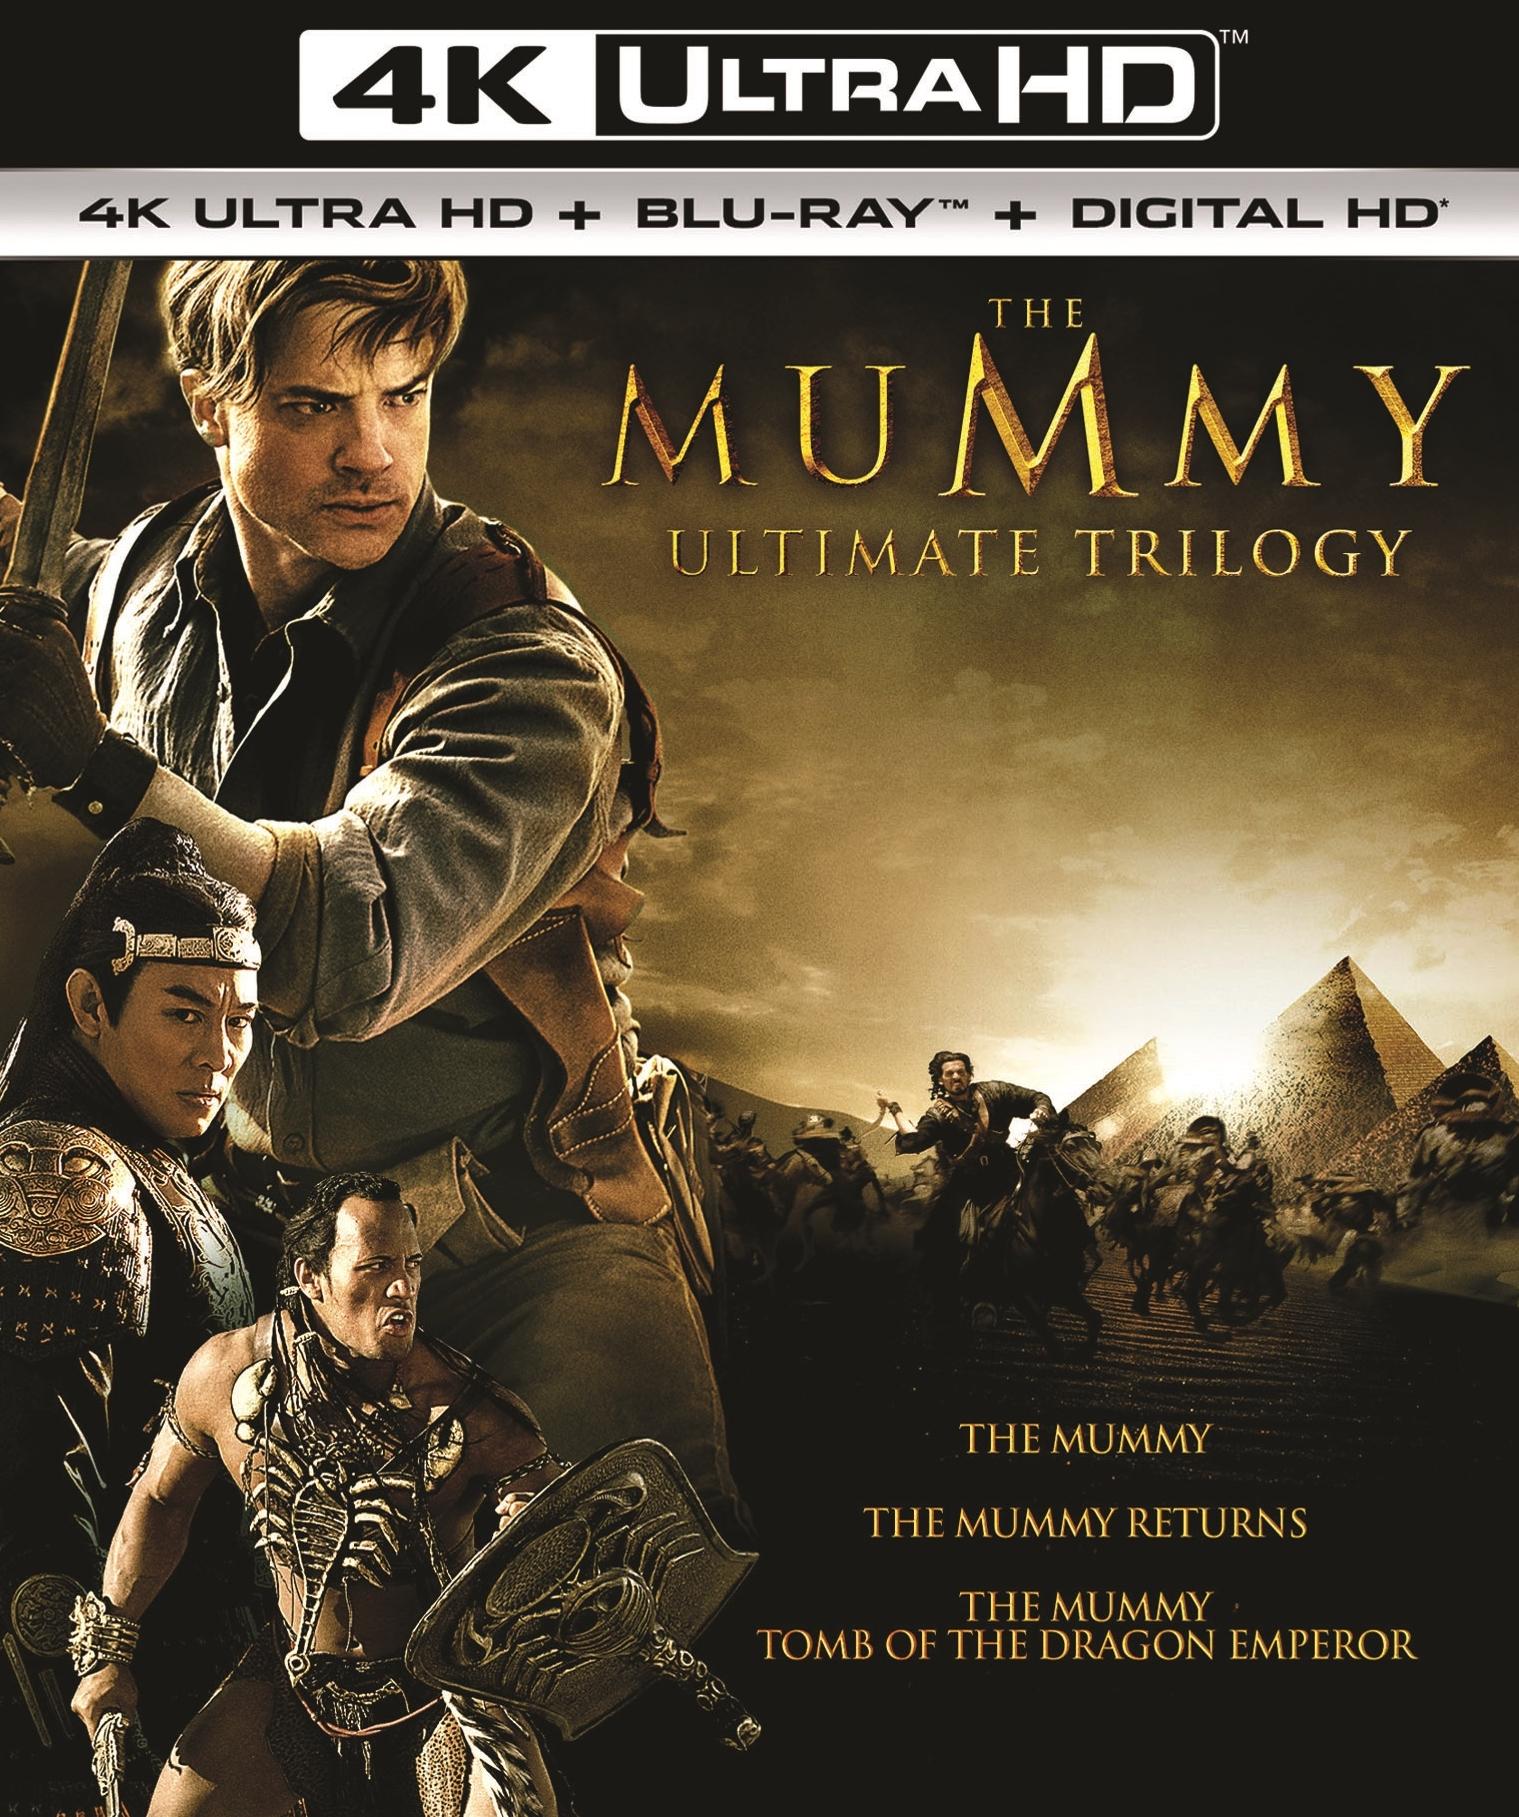 Mummy Ultimate Trilogy 4K UHD + Blu-Ray + Digital HD $24.99 @ Best Buy and Amazon